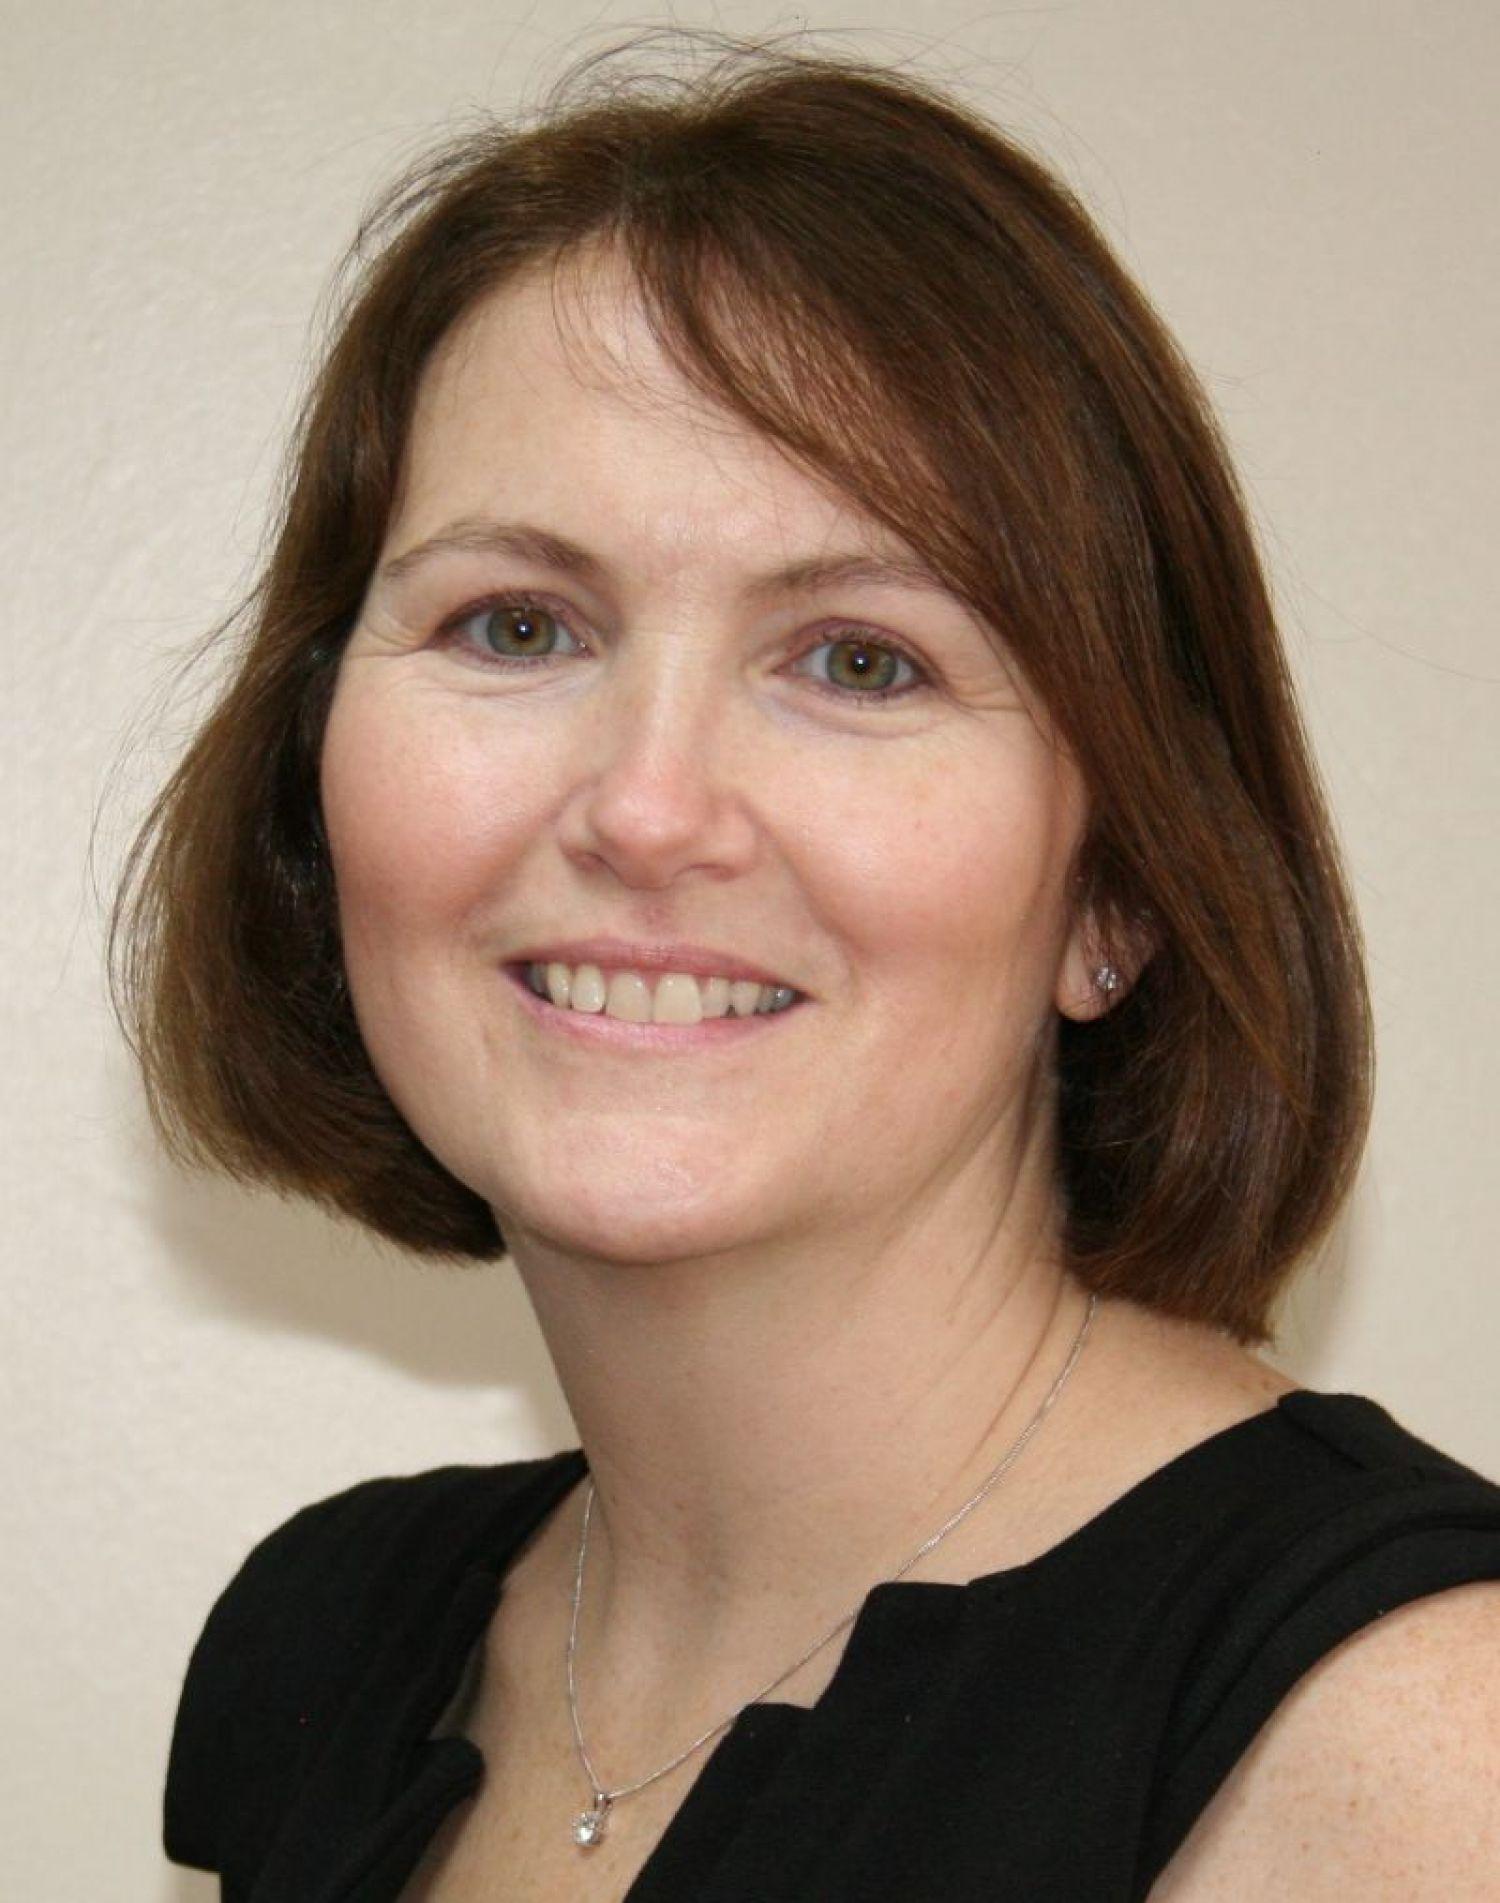 Spotlight on CCG Members - Alison Robinson - September 2020